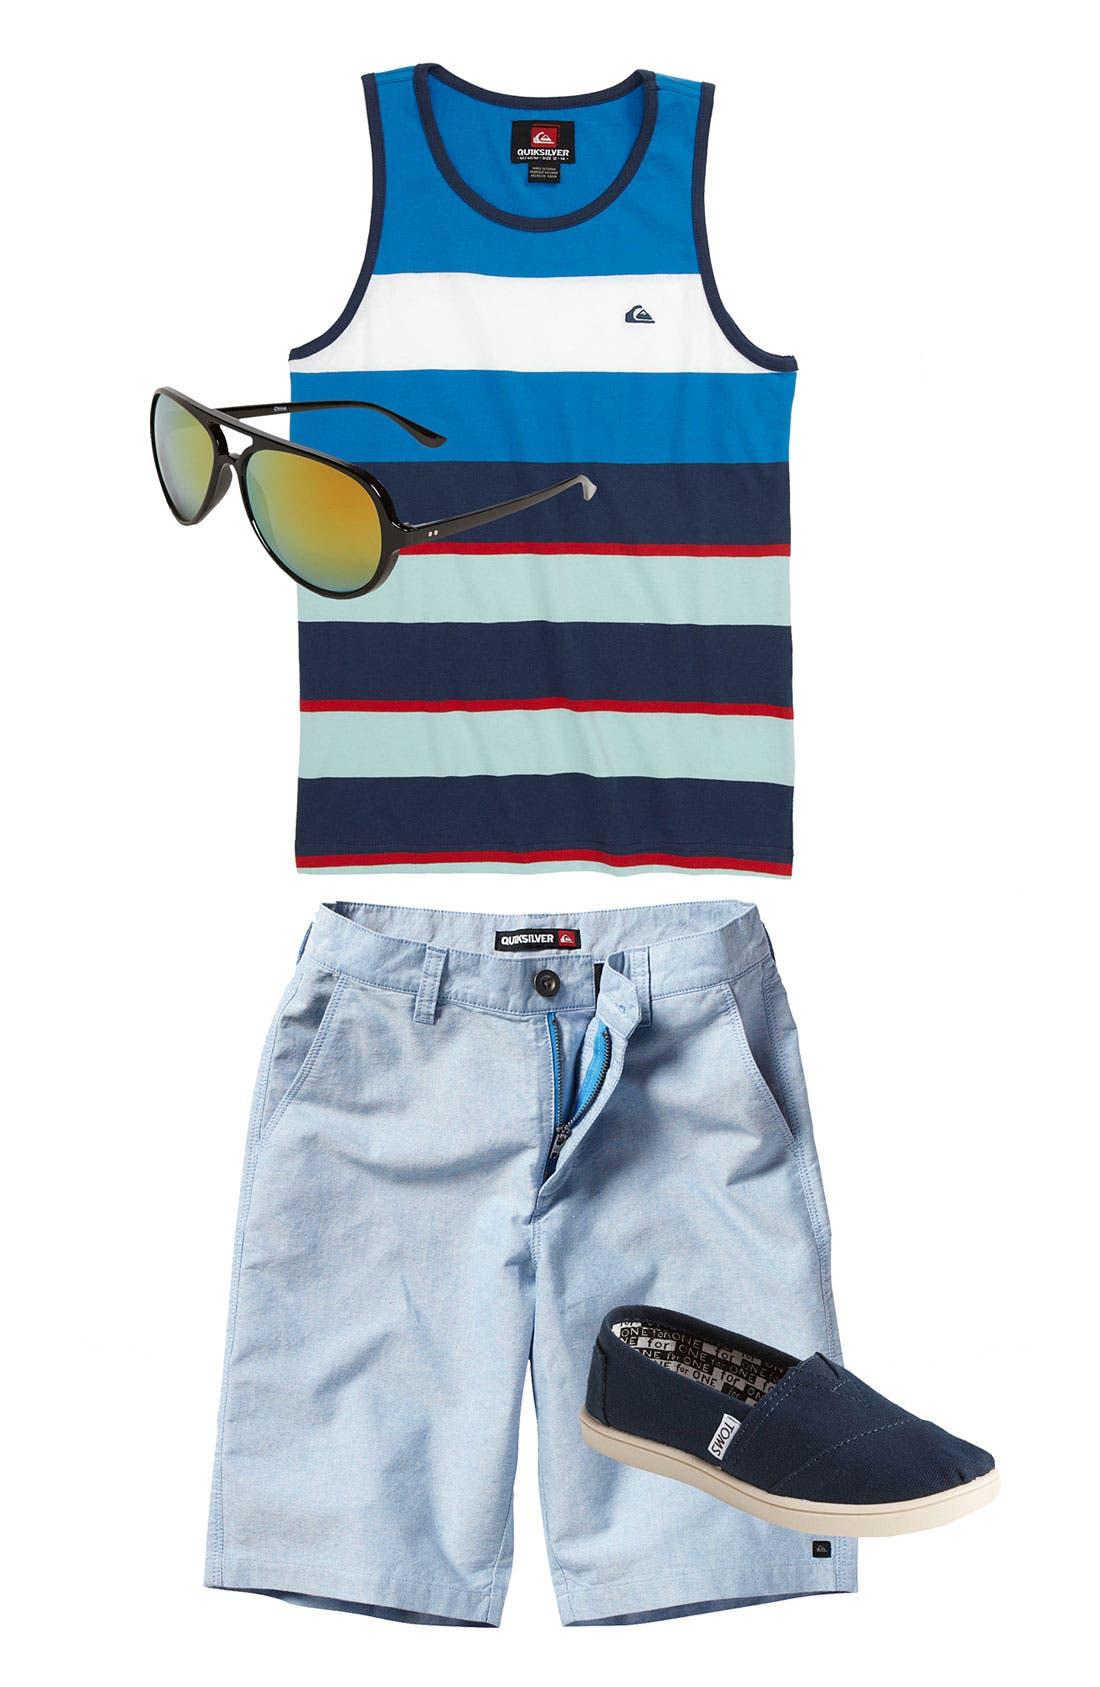 Alternate Image 1 Selected - Quiksilver Shirt & Shorts & Icon Eyewear Sunglasses (Big Boys)